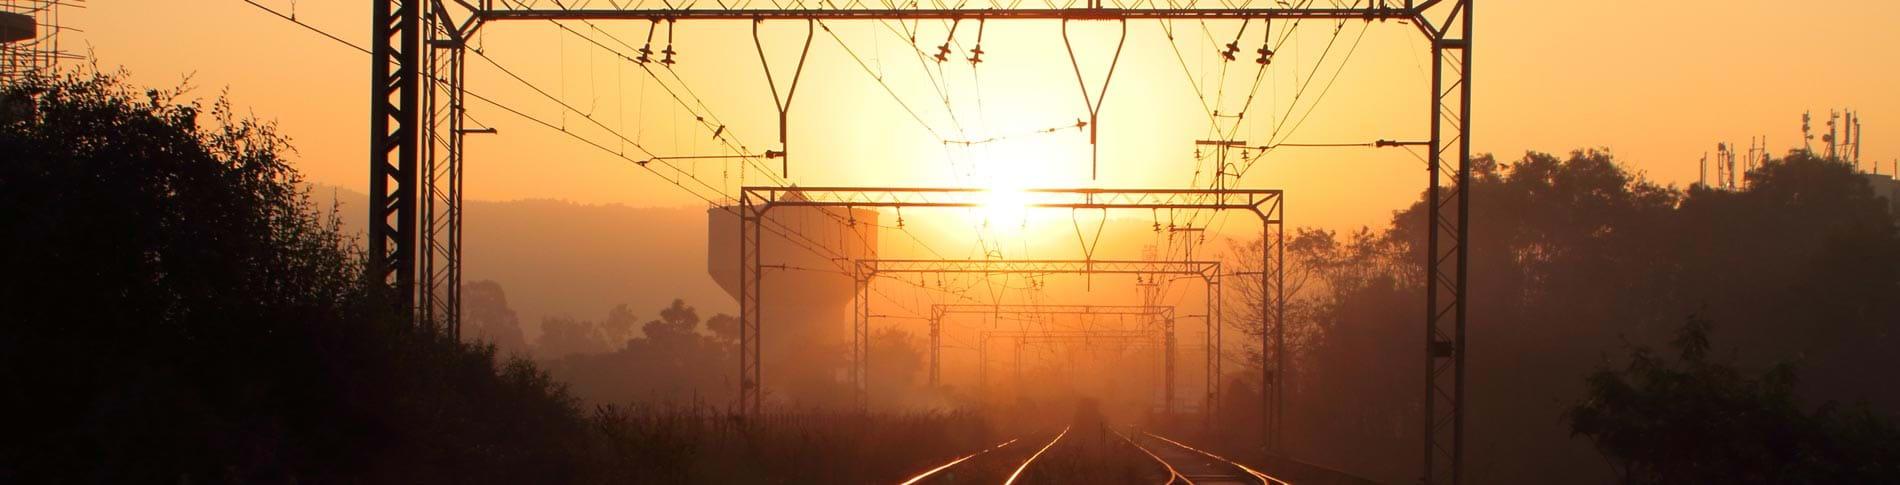 Rail Overhead Line Wires